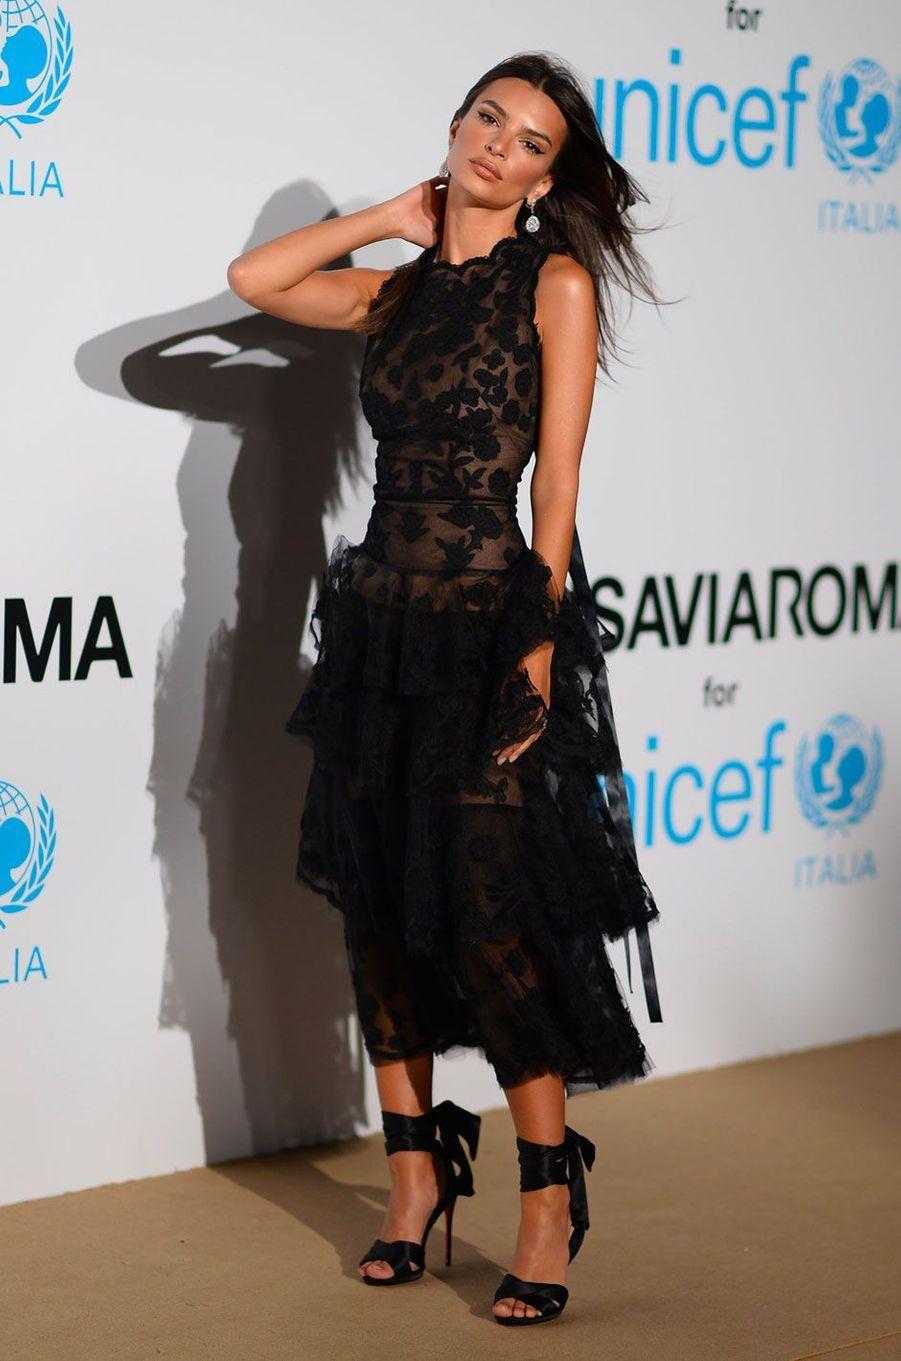 Emily Ratajkowski au gala de l'UNICEF à Porto Cervo (Sardaigne) le 10 août 2018